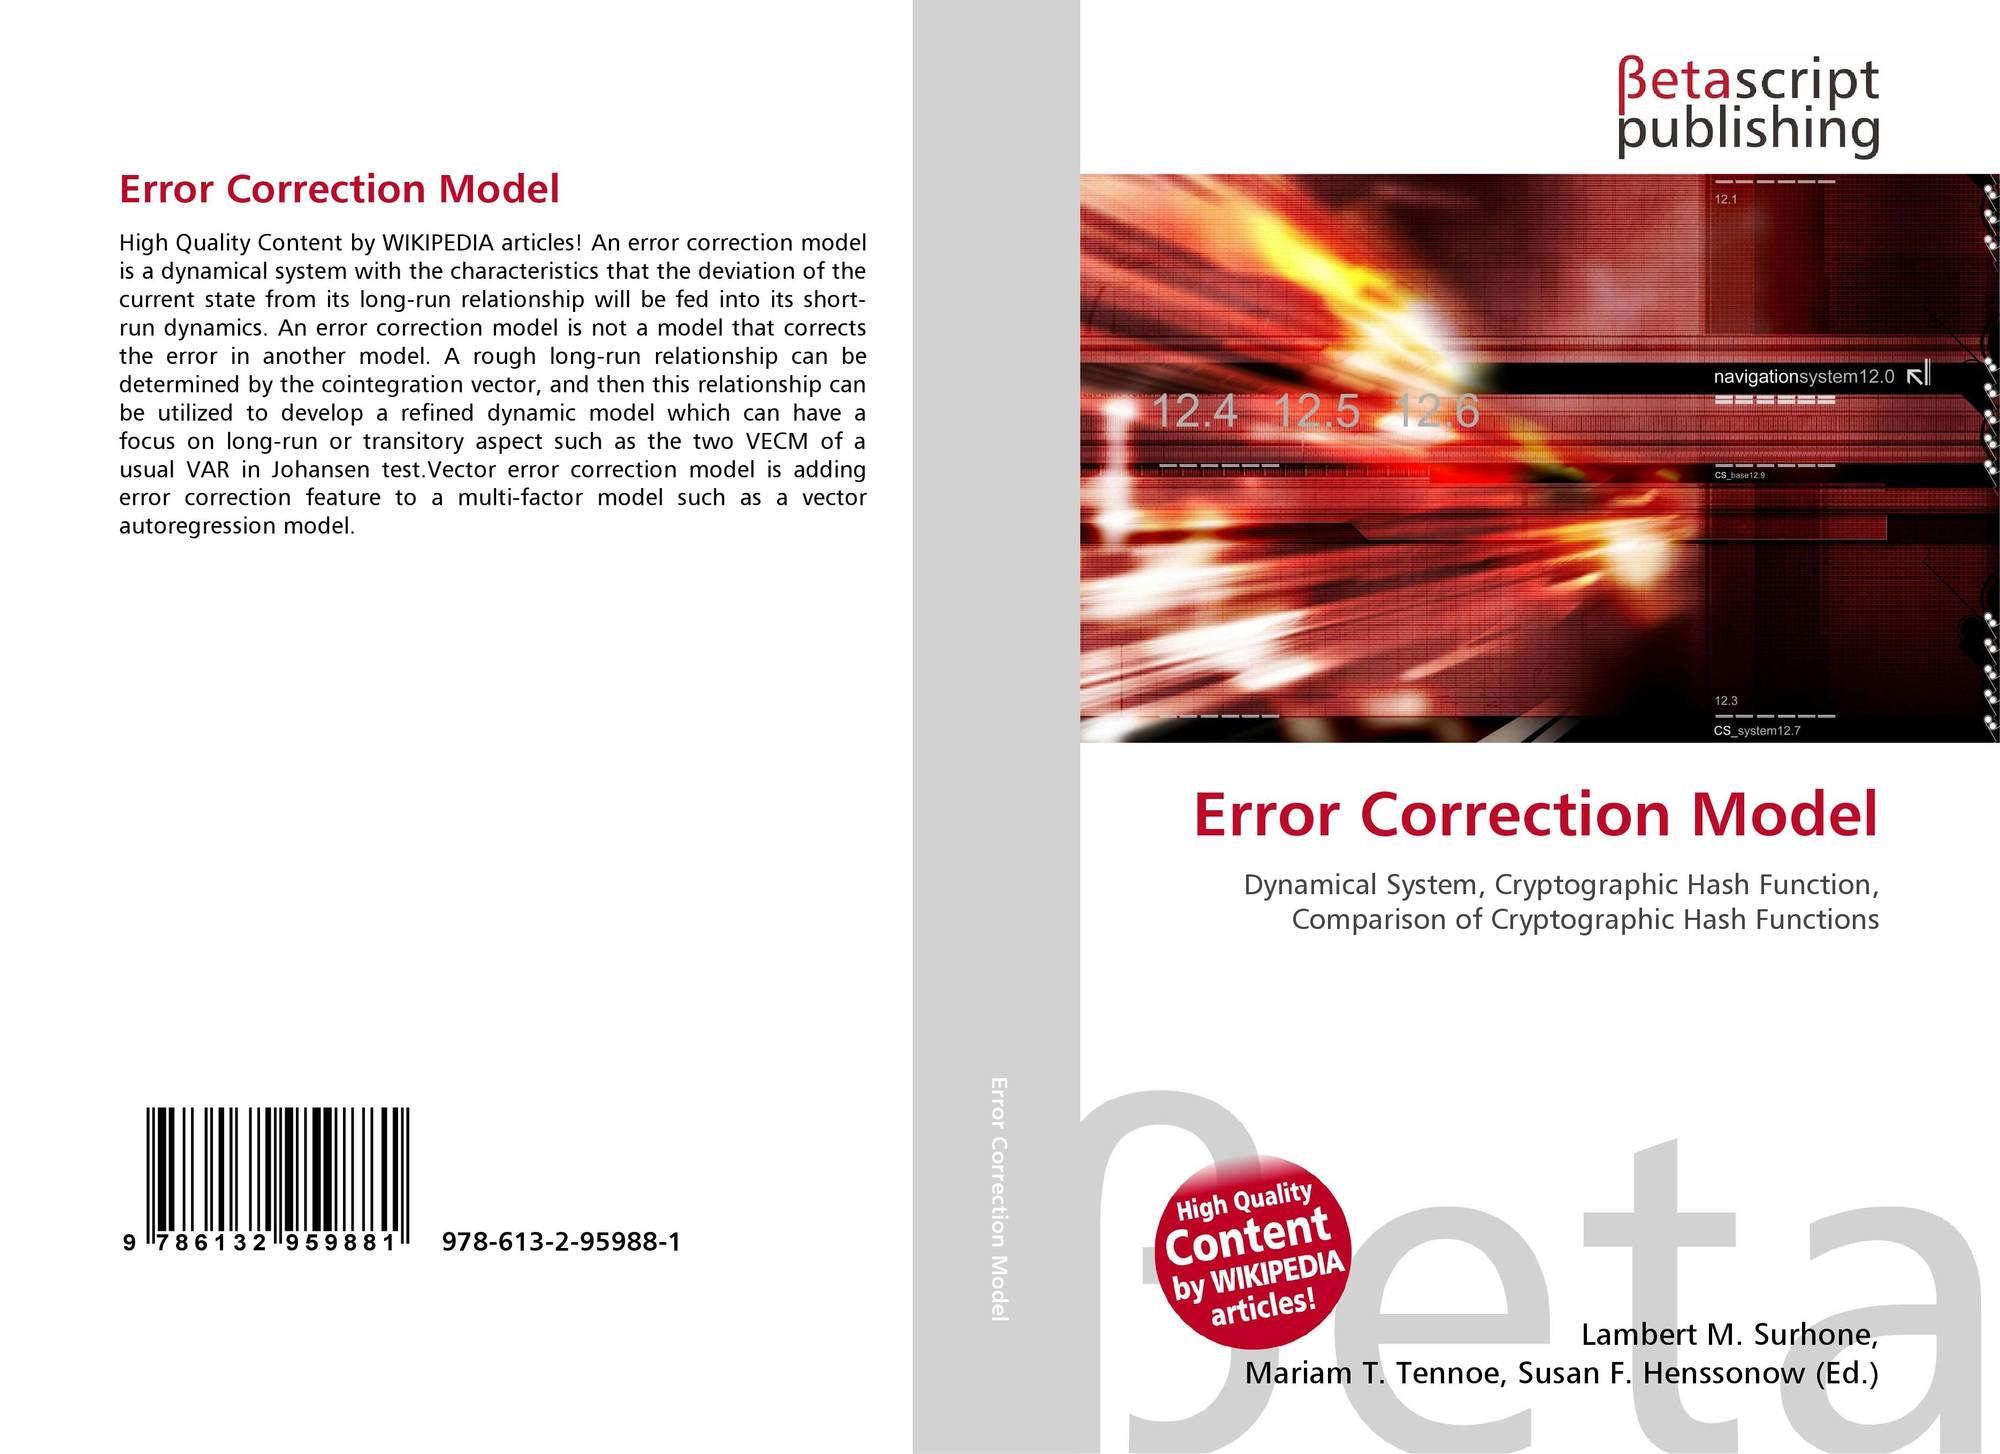 Error Correction Model, 978-613-2-95988-1, 6132959882